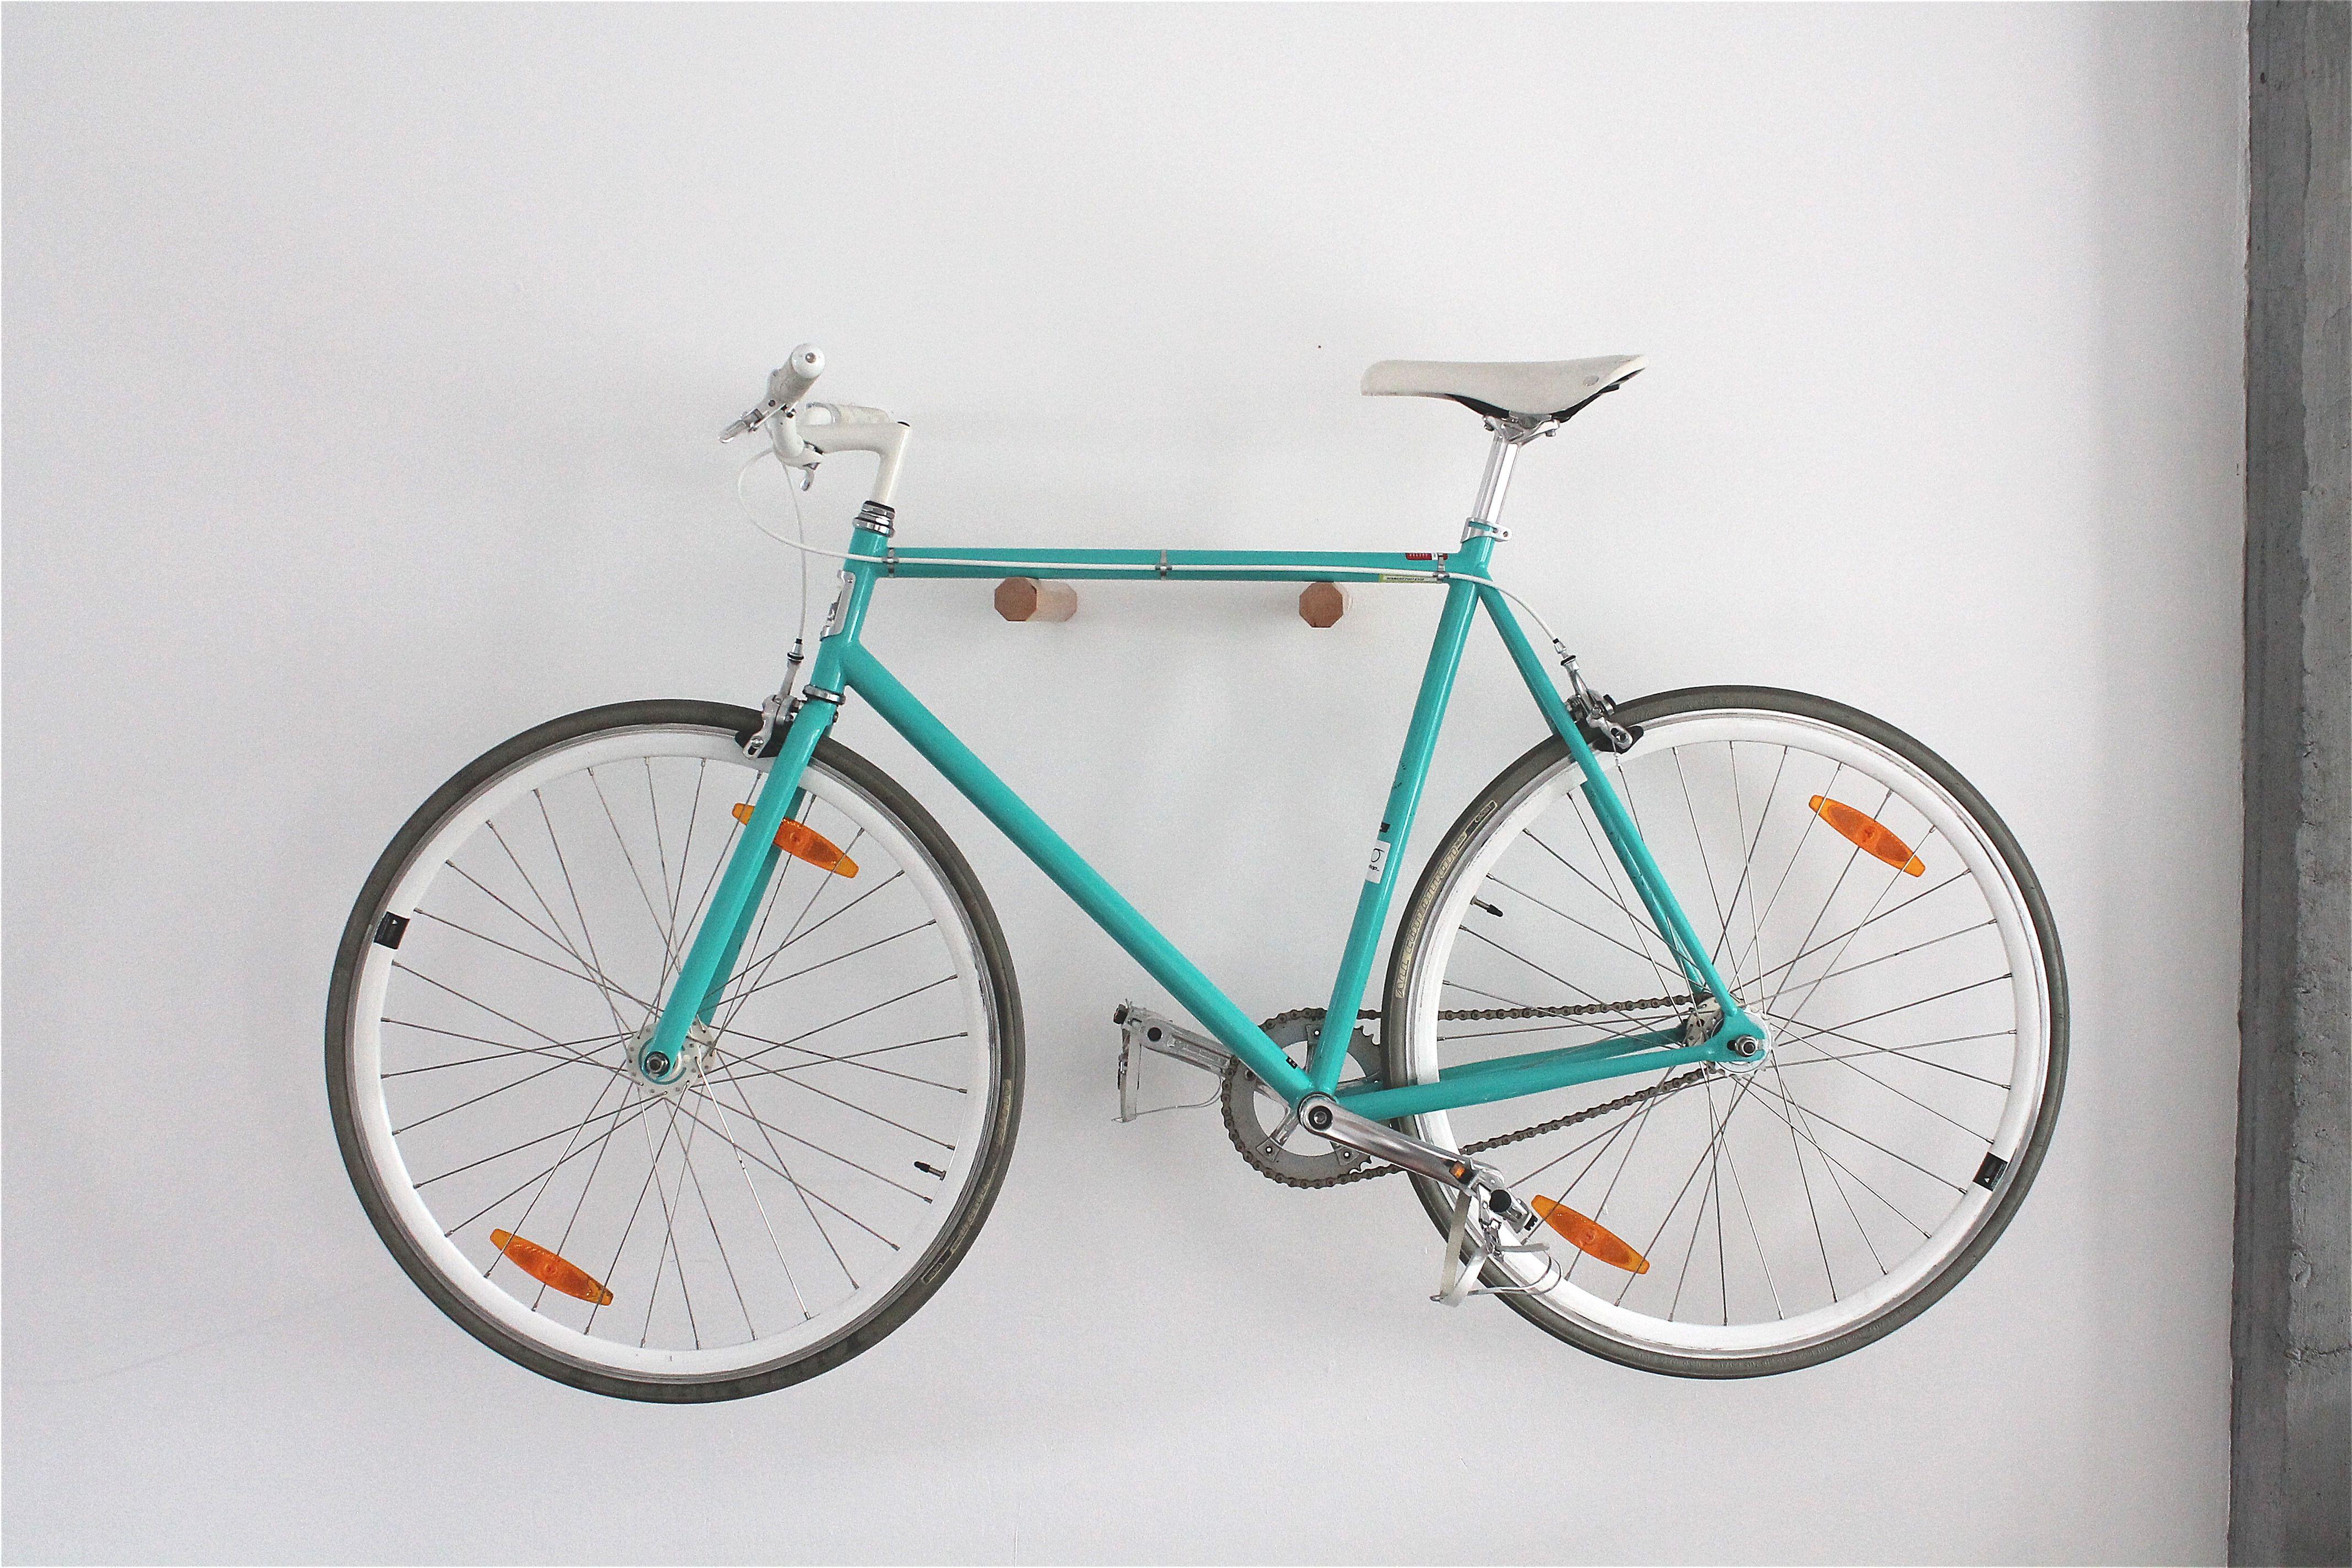 Fahrrad wandhalterung henry fahrrad wandhalter rennrad wandhalterung fixie bikeshelf - Rennrad wandhalterung ...